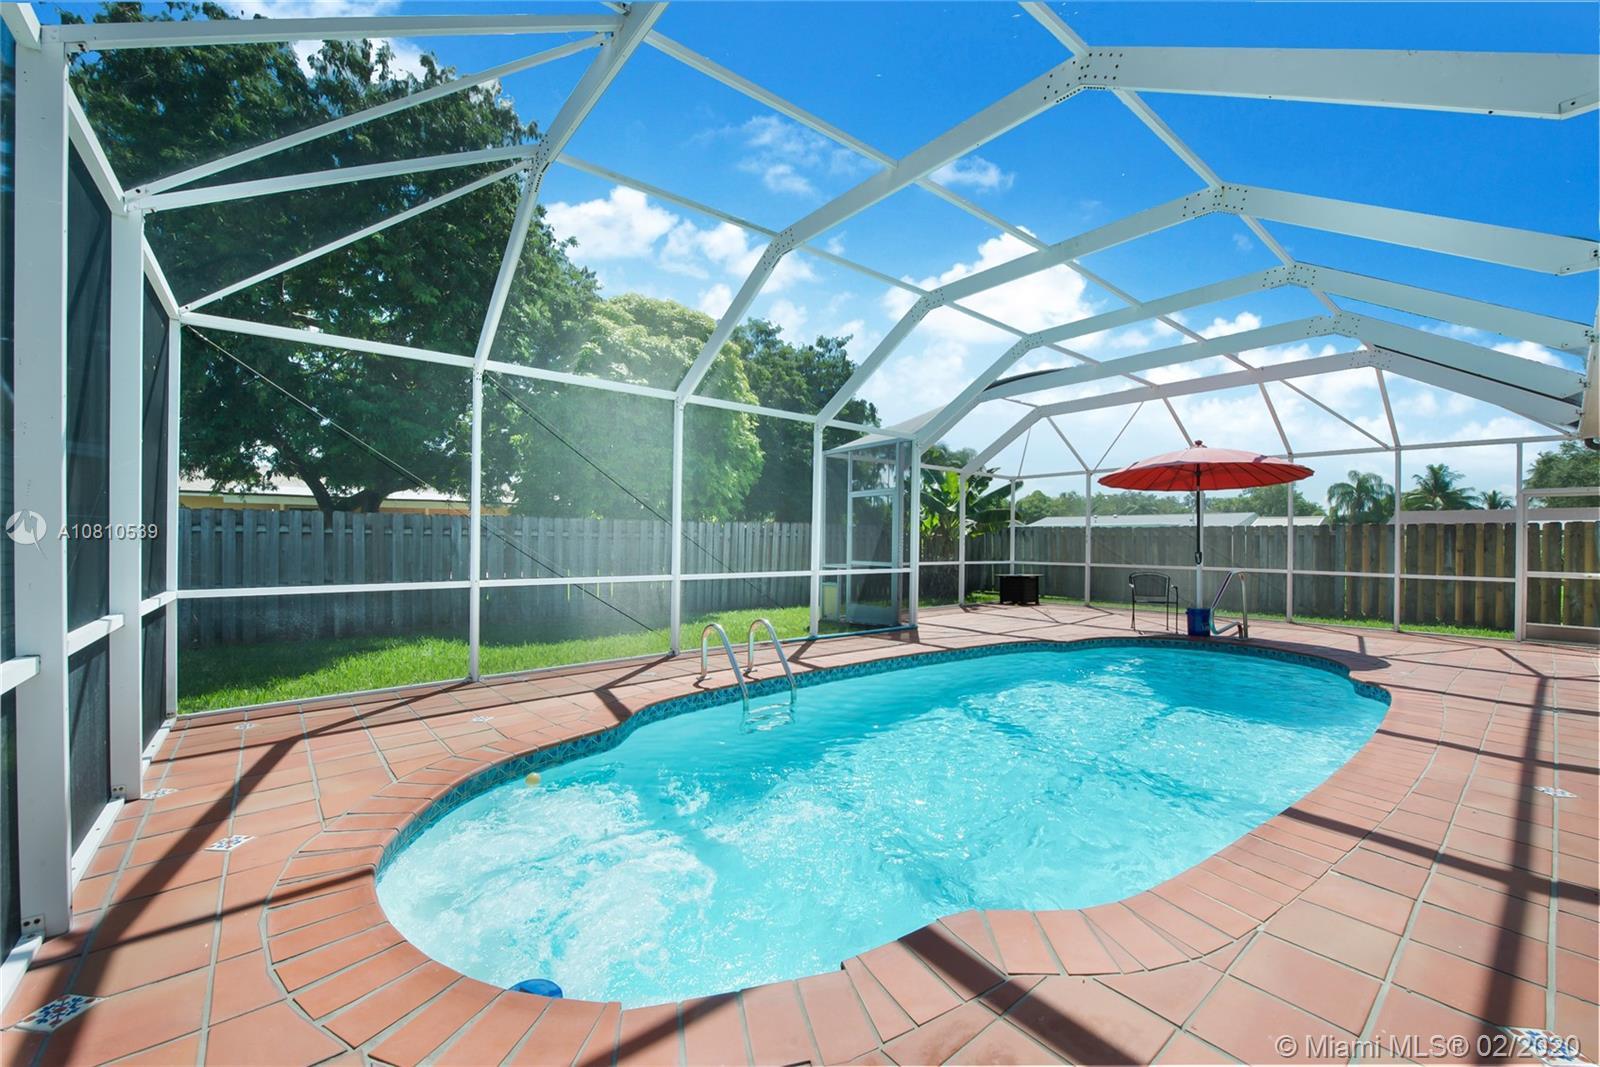 18531 SW 92nd Ct, Cutler Bay, FL 33157 - Cutler Bay, FL real estate listing